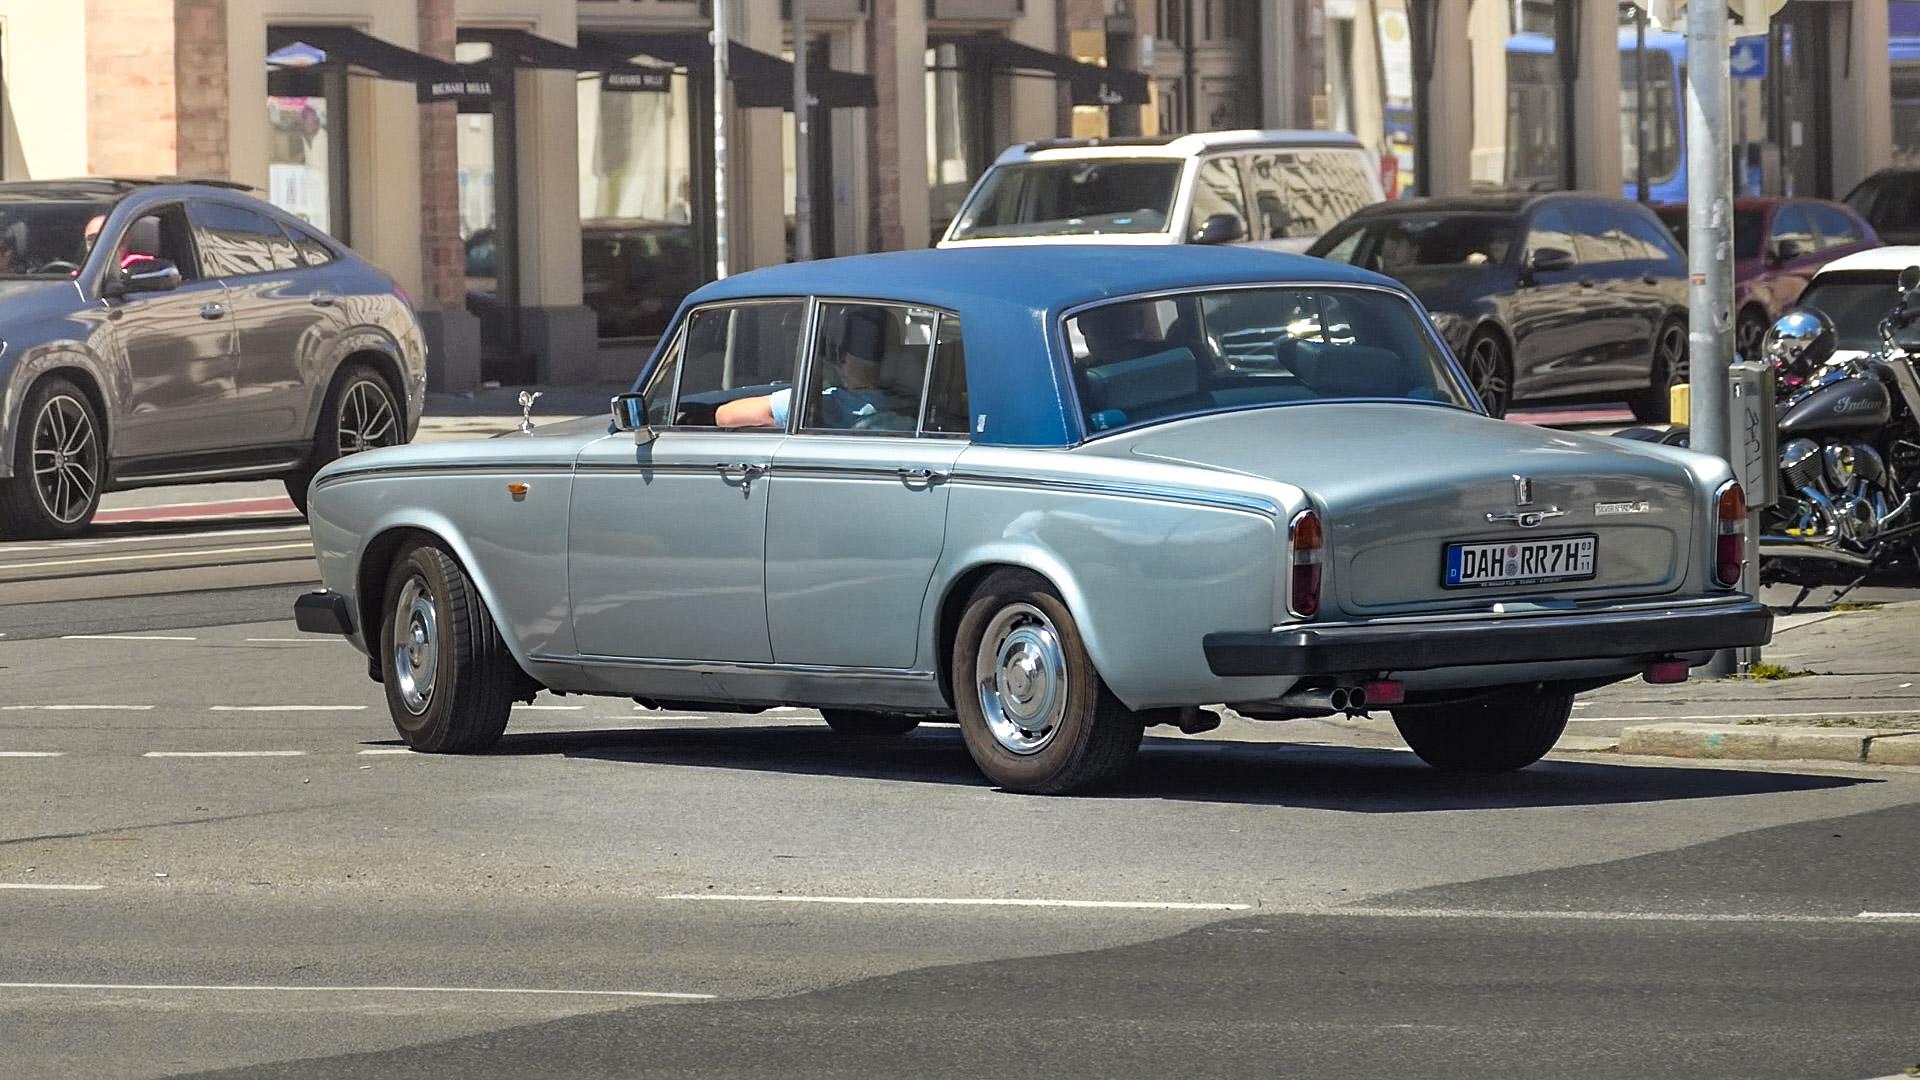 Rolls Royce Silver Shadow - DAH-RR-7H